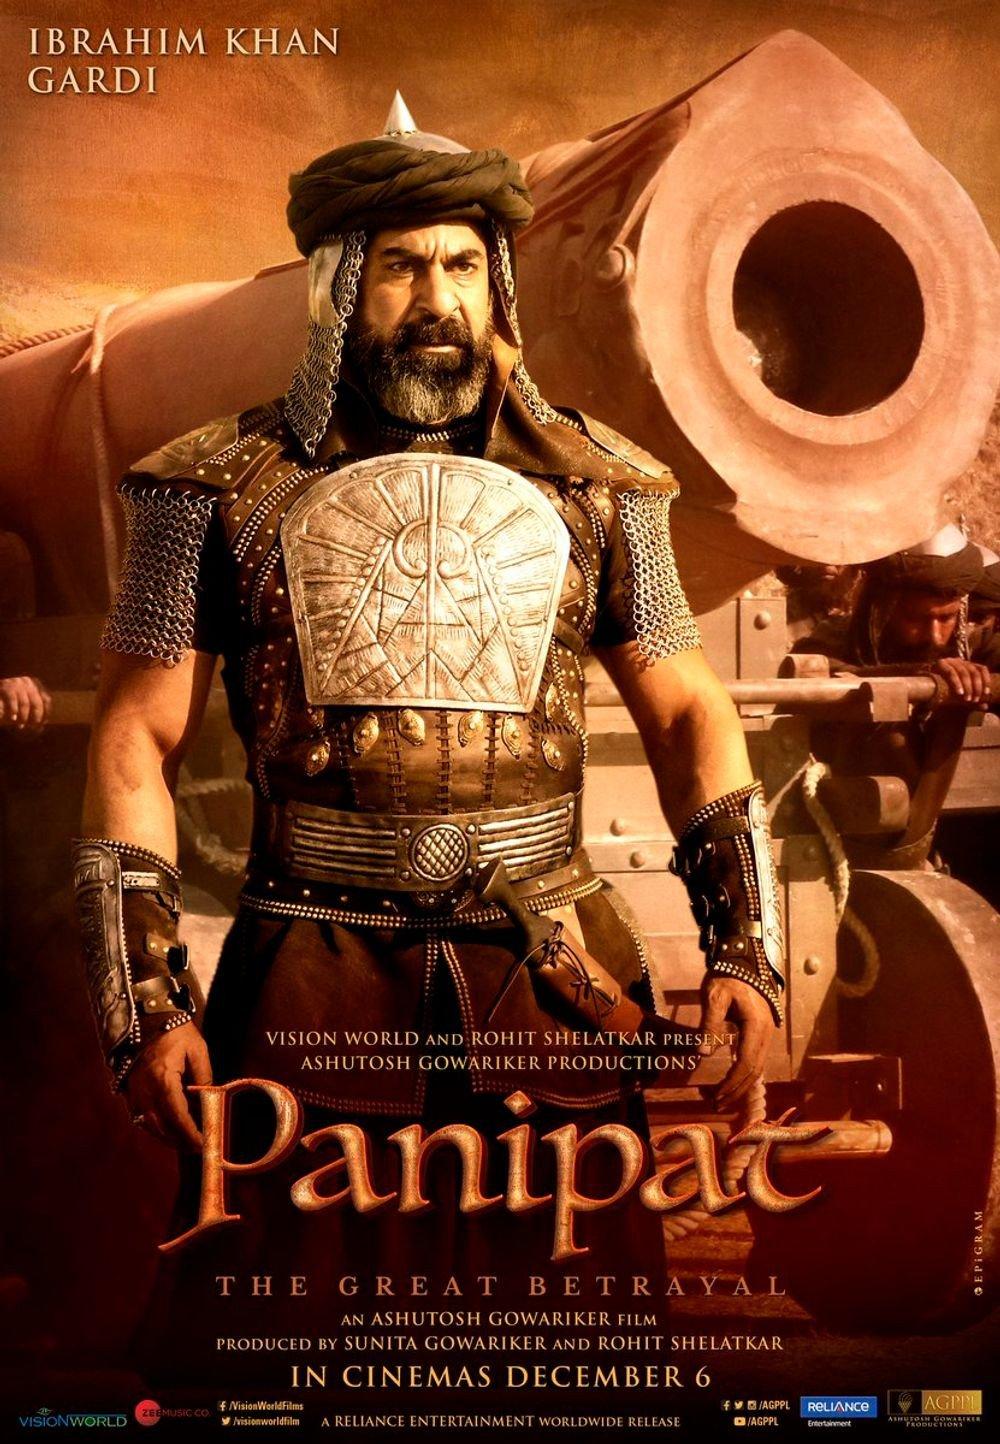 2-<p>Panipat</p>